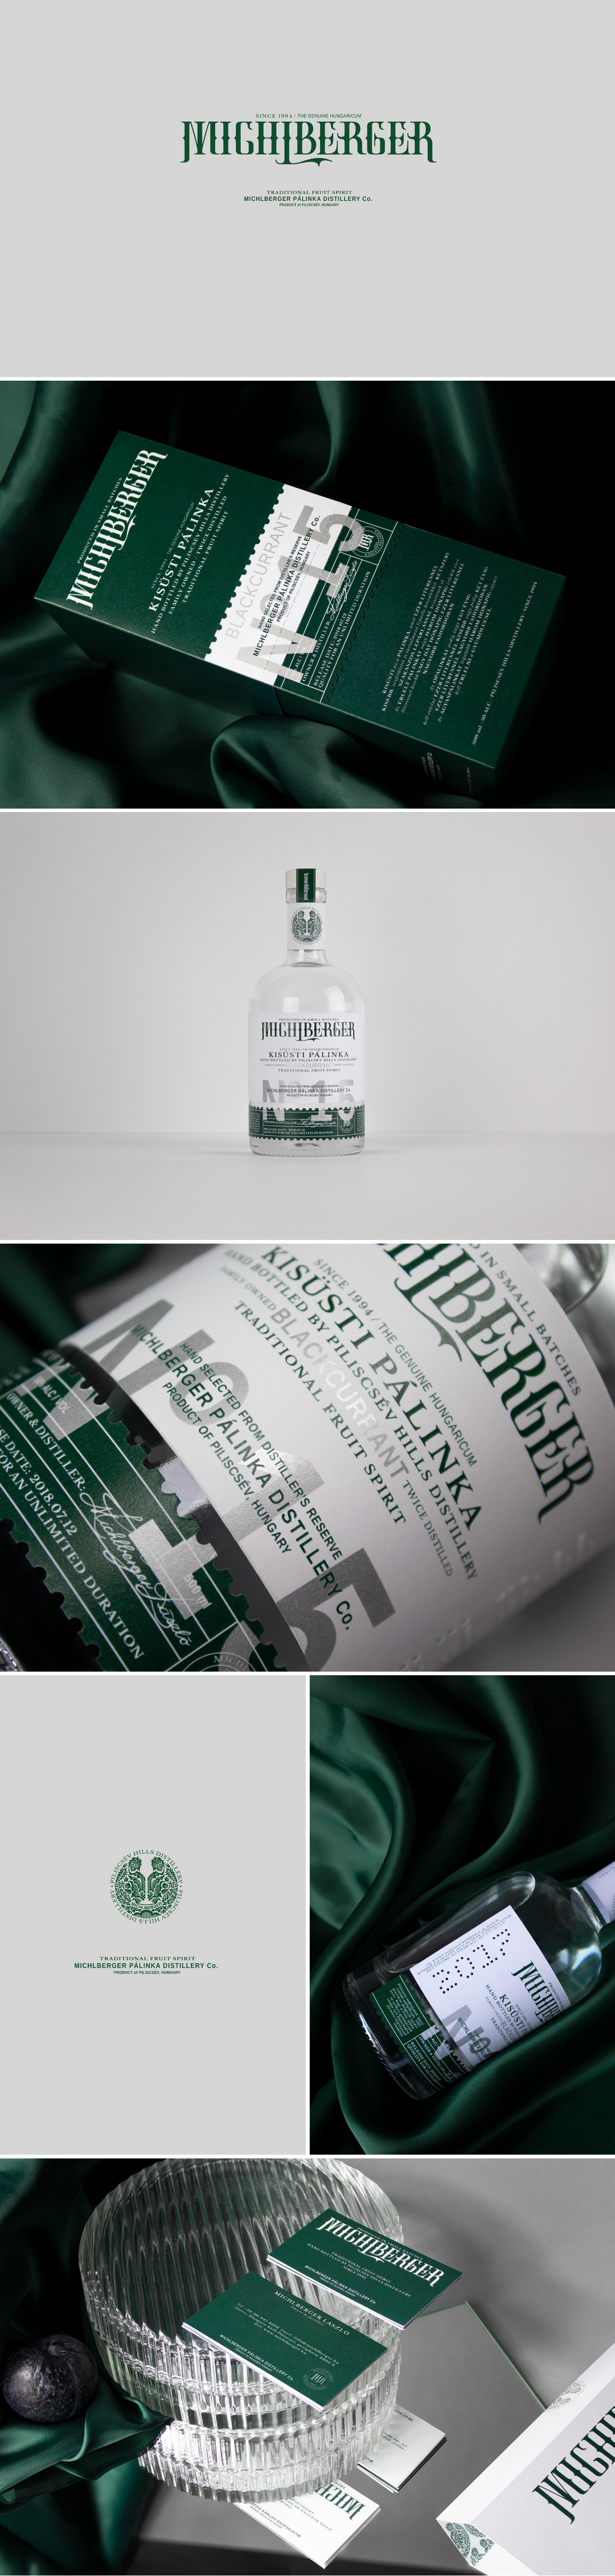 Branding,Graphic Design,Packaging